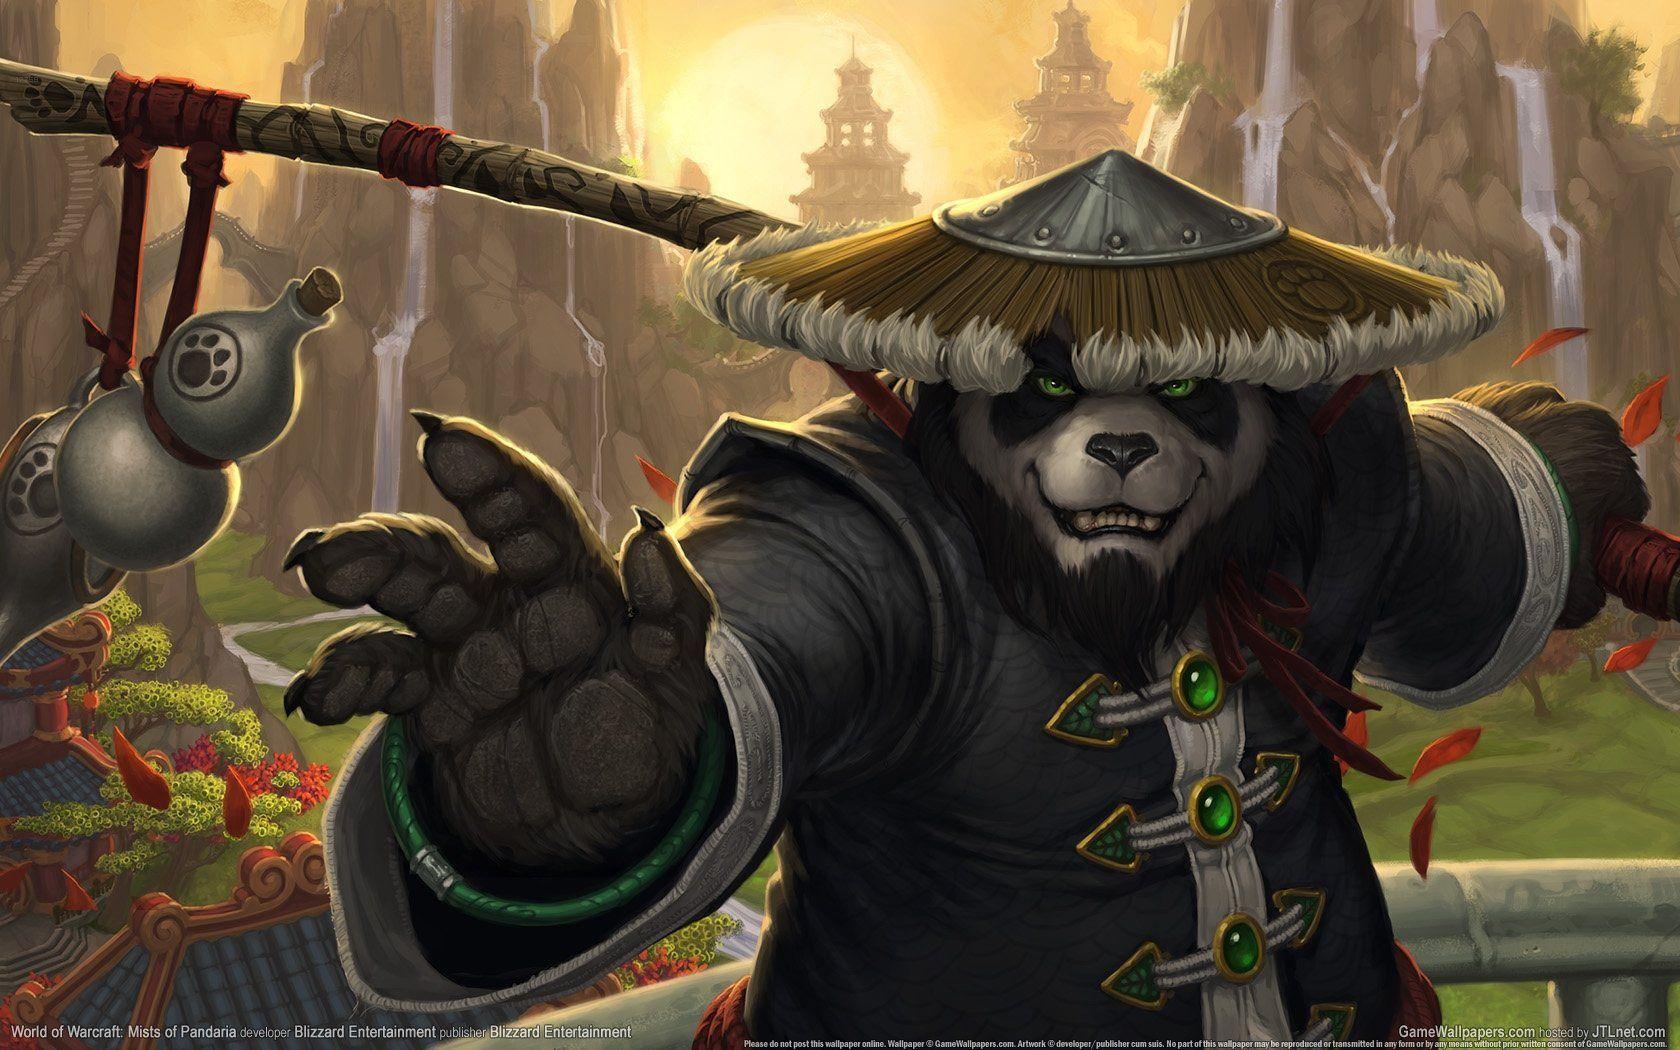 Download .torrent - World of Warcraft Mists of Pandaria 2012 - PC - http://www.torrentsbees.com/fi/pc/world-of-warcraft-mists-of-pandaria-2012-pc.html